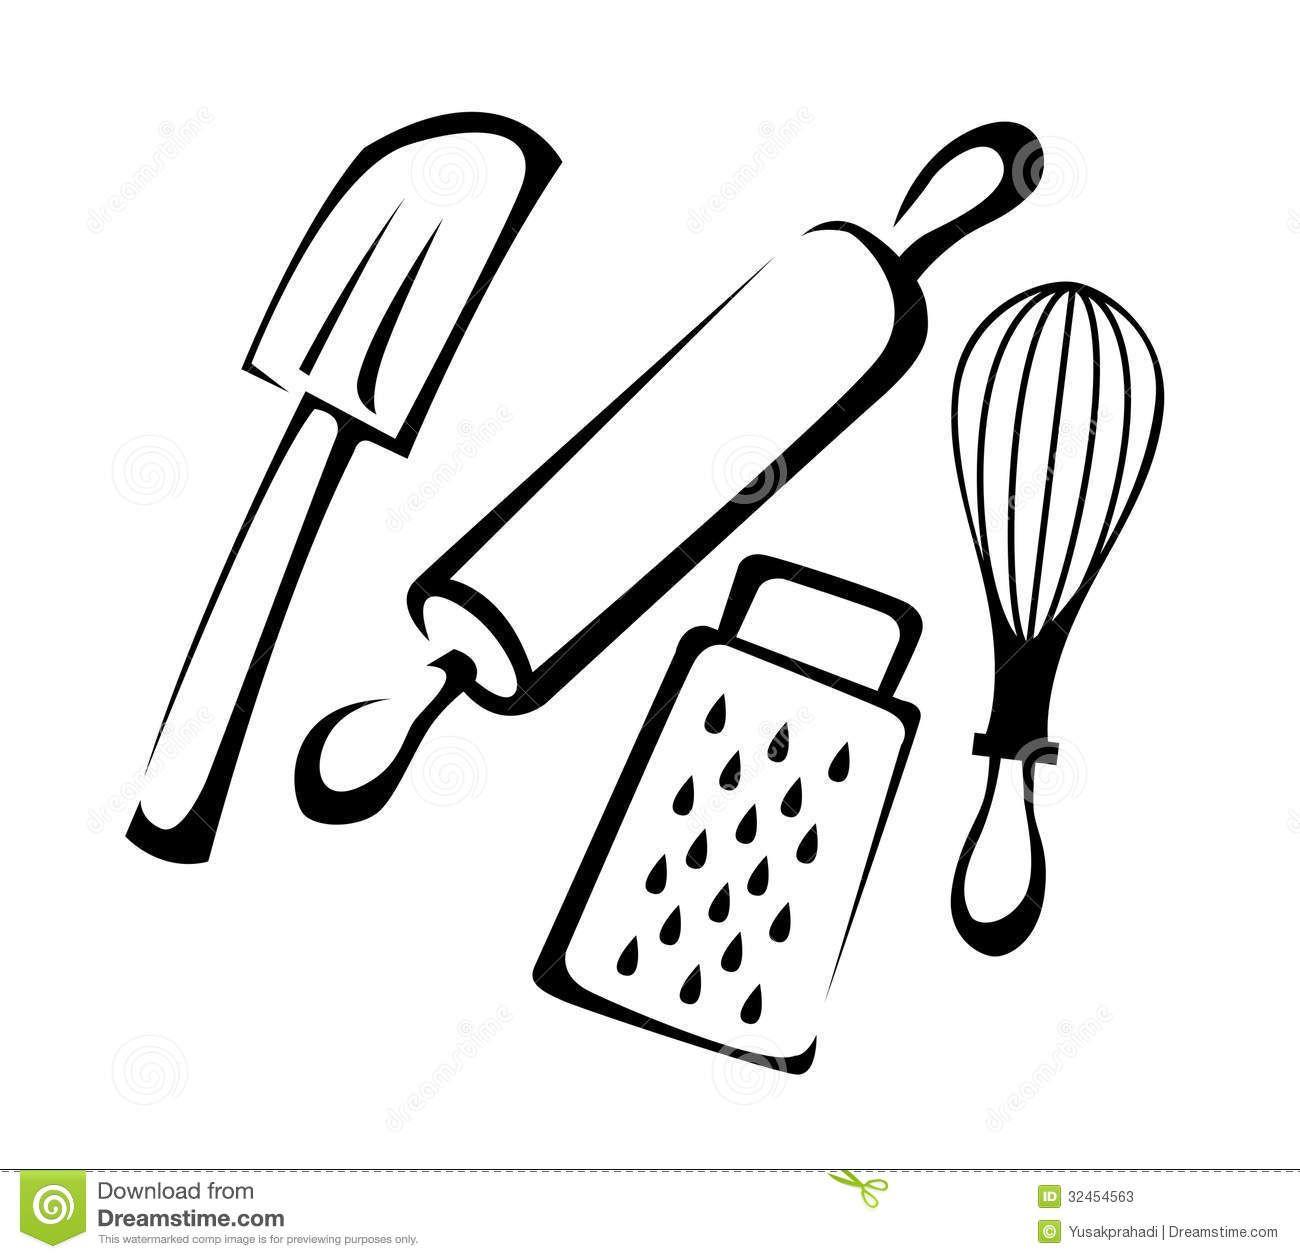 Chef utensils clipart clip art free Baking Utensils Stock Photos Image 32454563 | chef hats | Baking ... clip art free